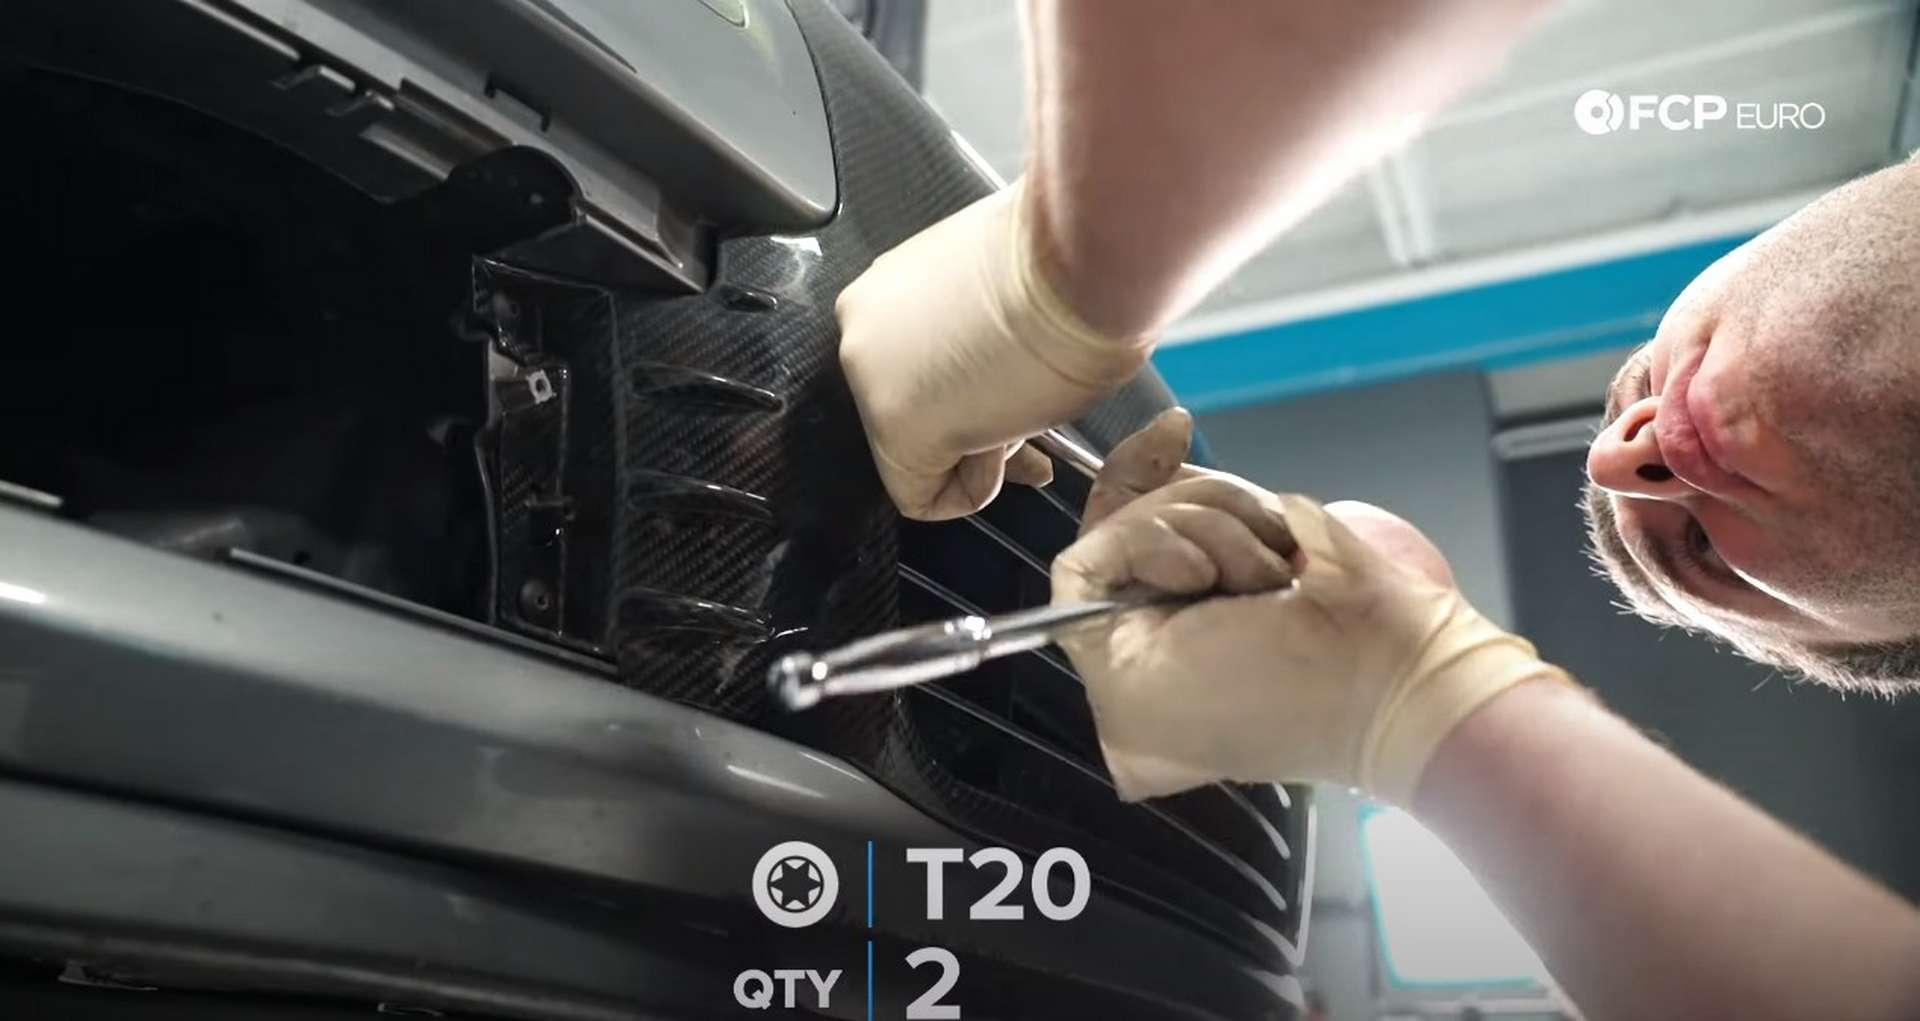 67-DIY-VW-VR6-Valve-Cover-Gasket-Reset-The-Nose